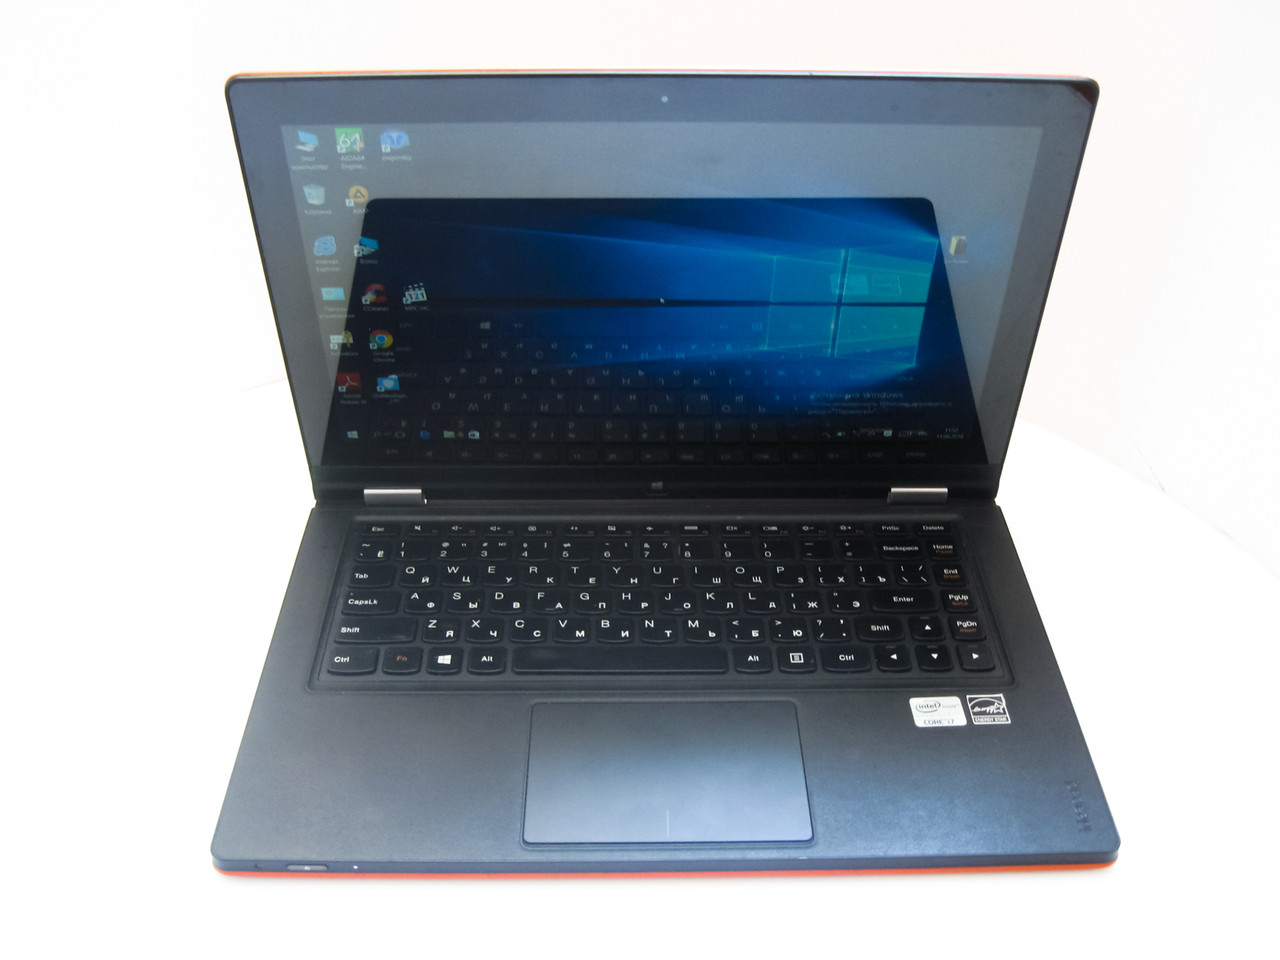 Трансформер Lenovo Yoga 13 IPS 13.3  (1600x900) / Intel Core i7-3517U  4